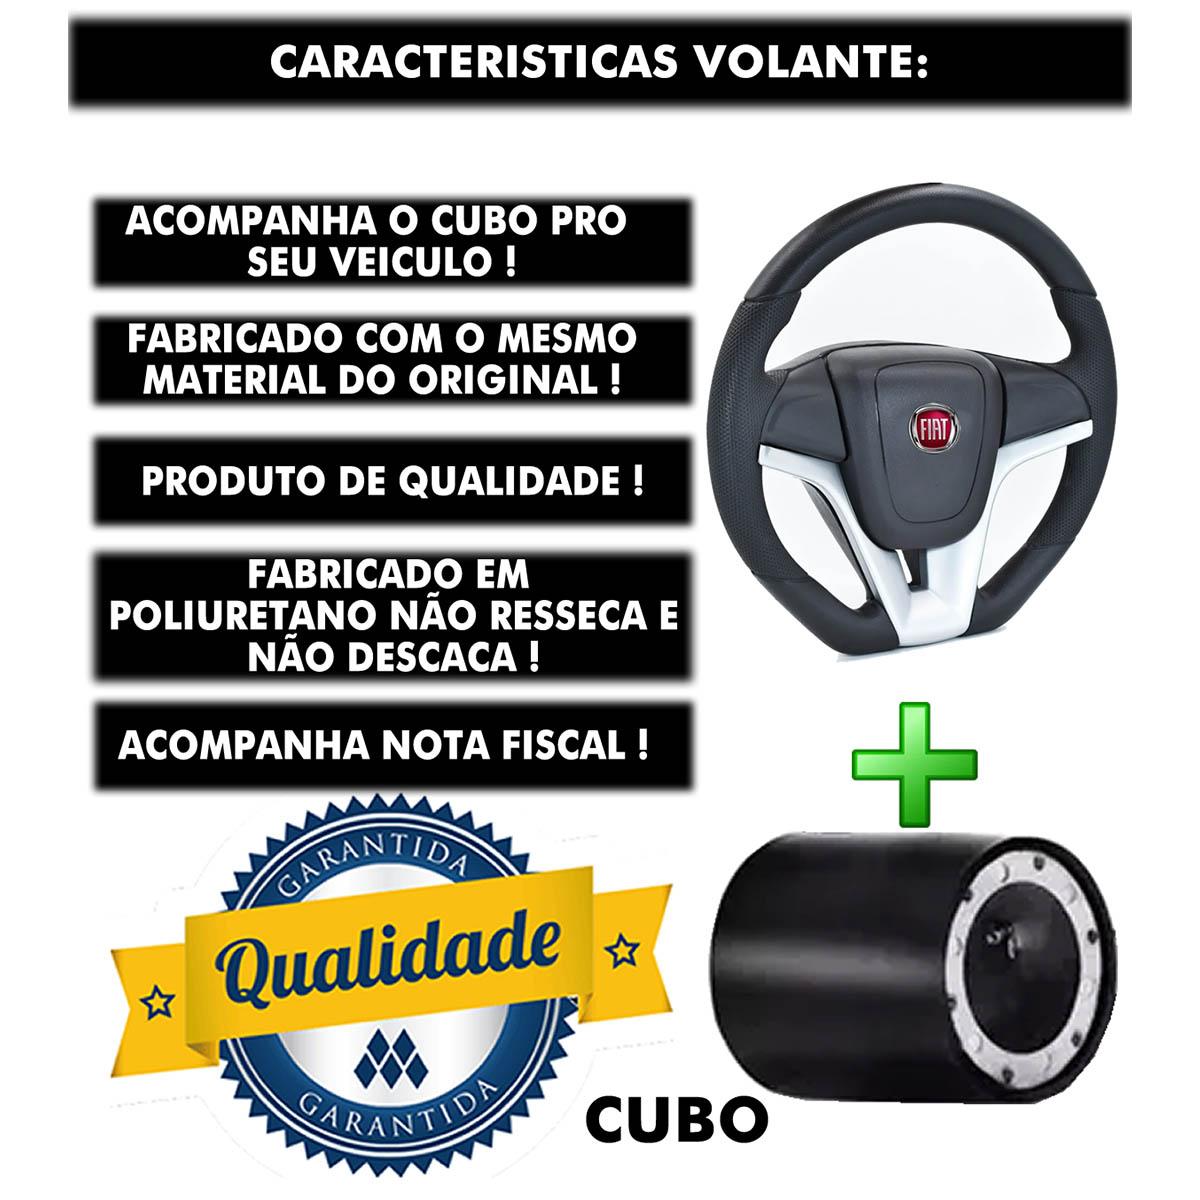 Volante Fiat Camaro Esportivo Cubo Palio Uno 1983 a 2013 Siena Strada Punto Stilo Idea Poliparts